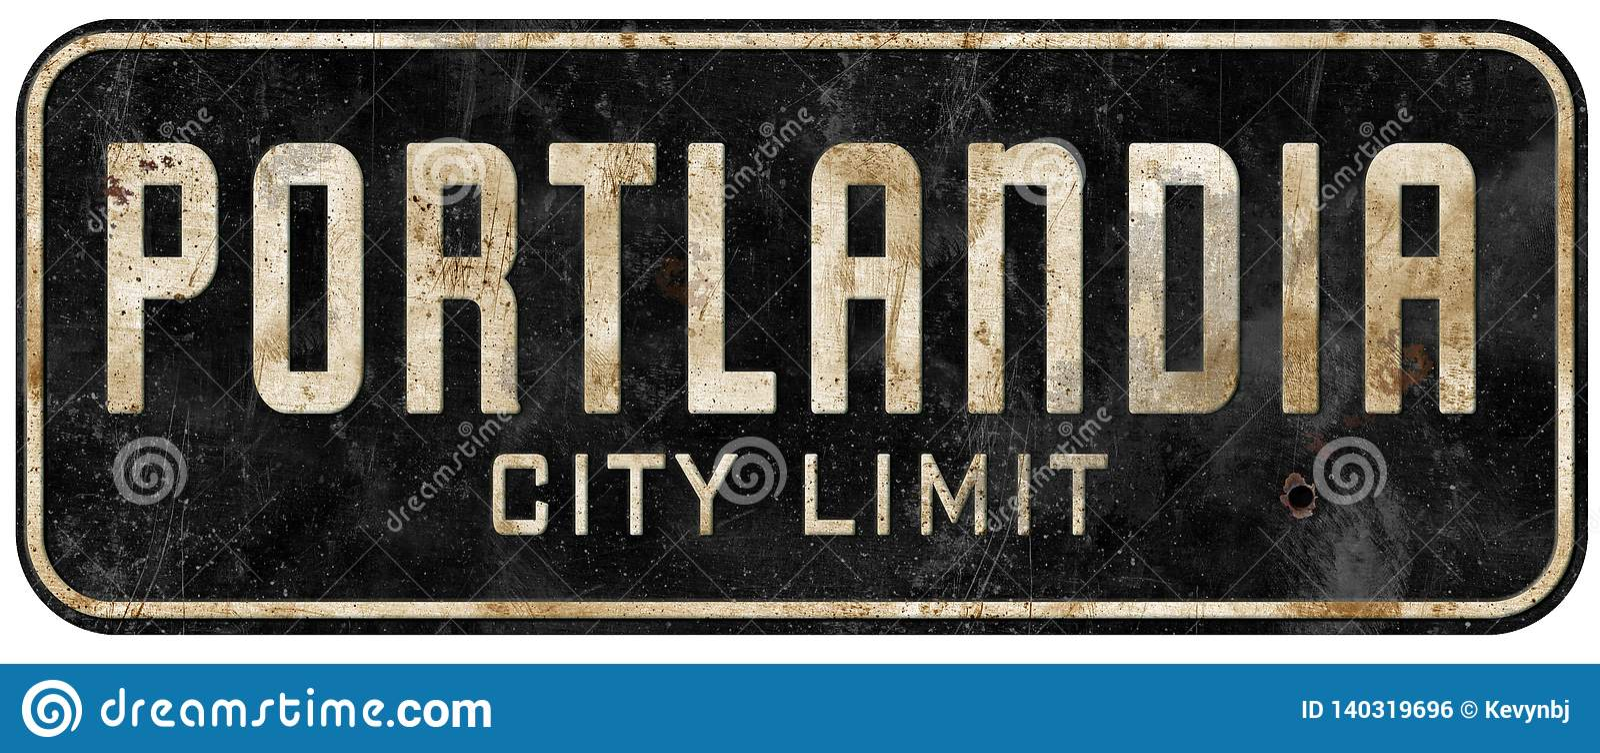 Portland Oregon Portlandia city limit sign grunge vintage